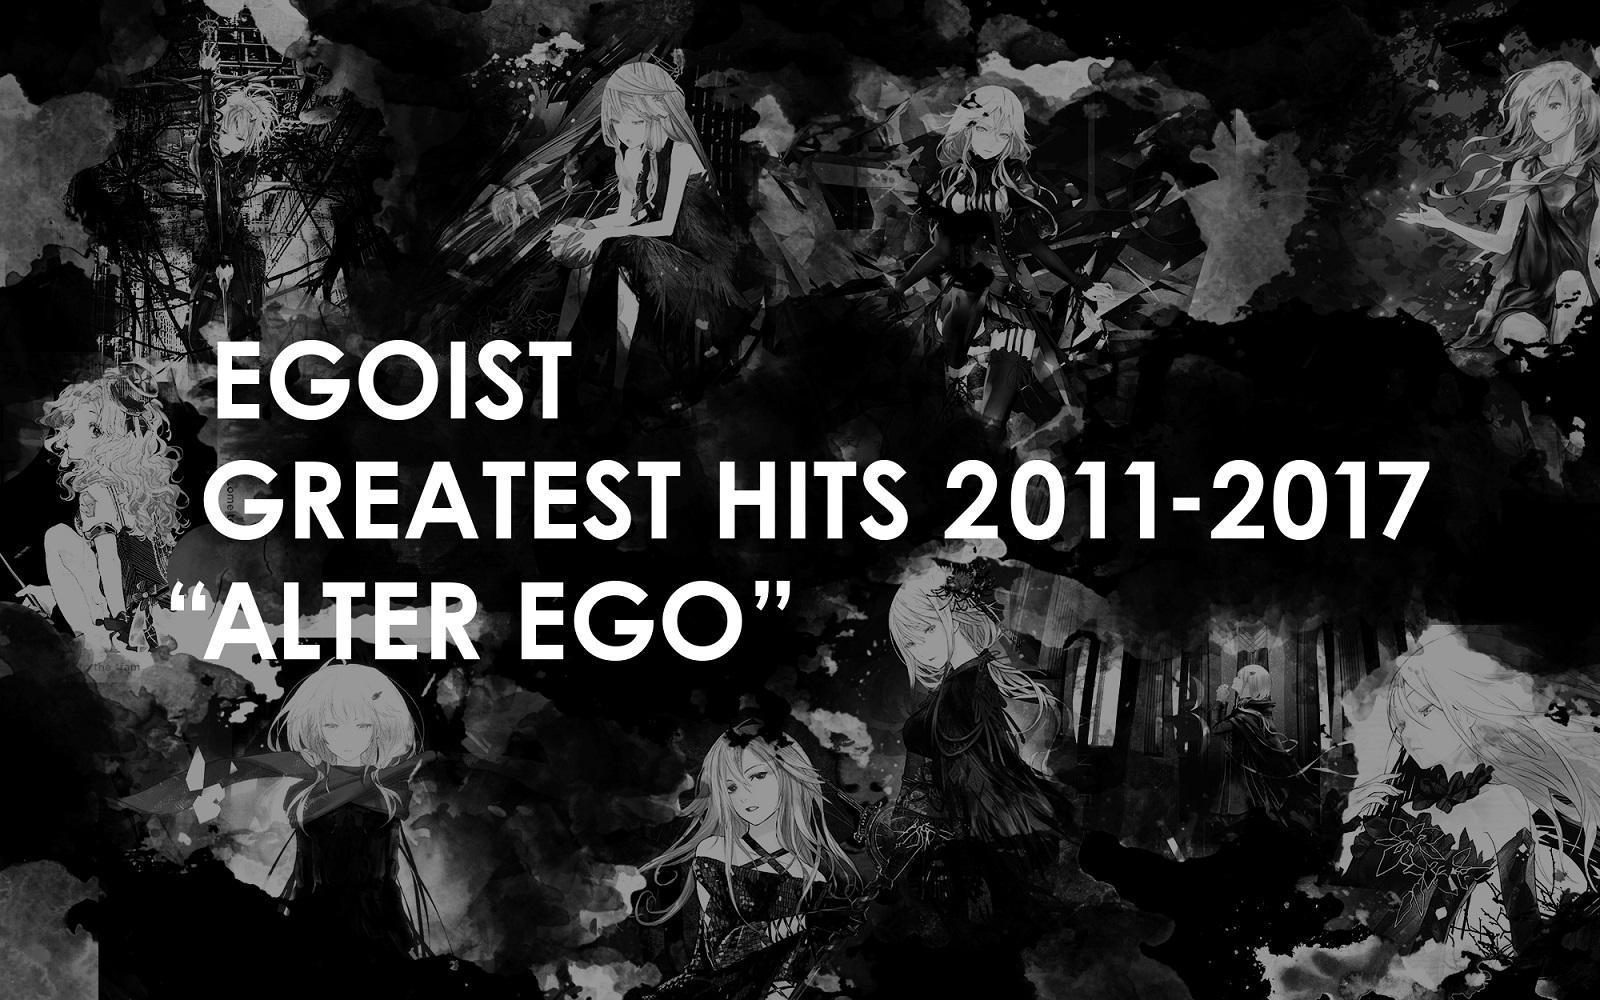 EGOIST 初のBEST ALBUMを12月27日(水)リリース!年末にはスペシャルライブも開催